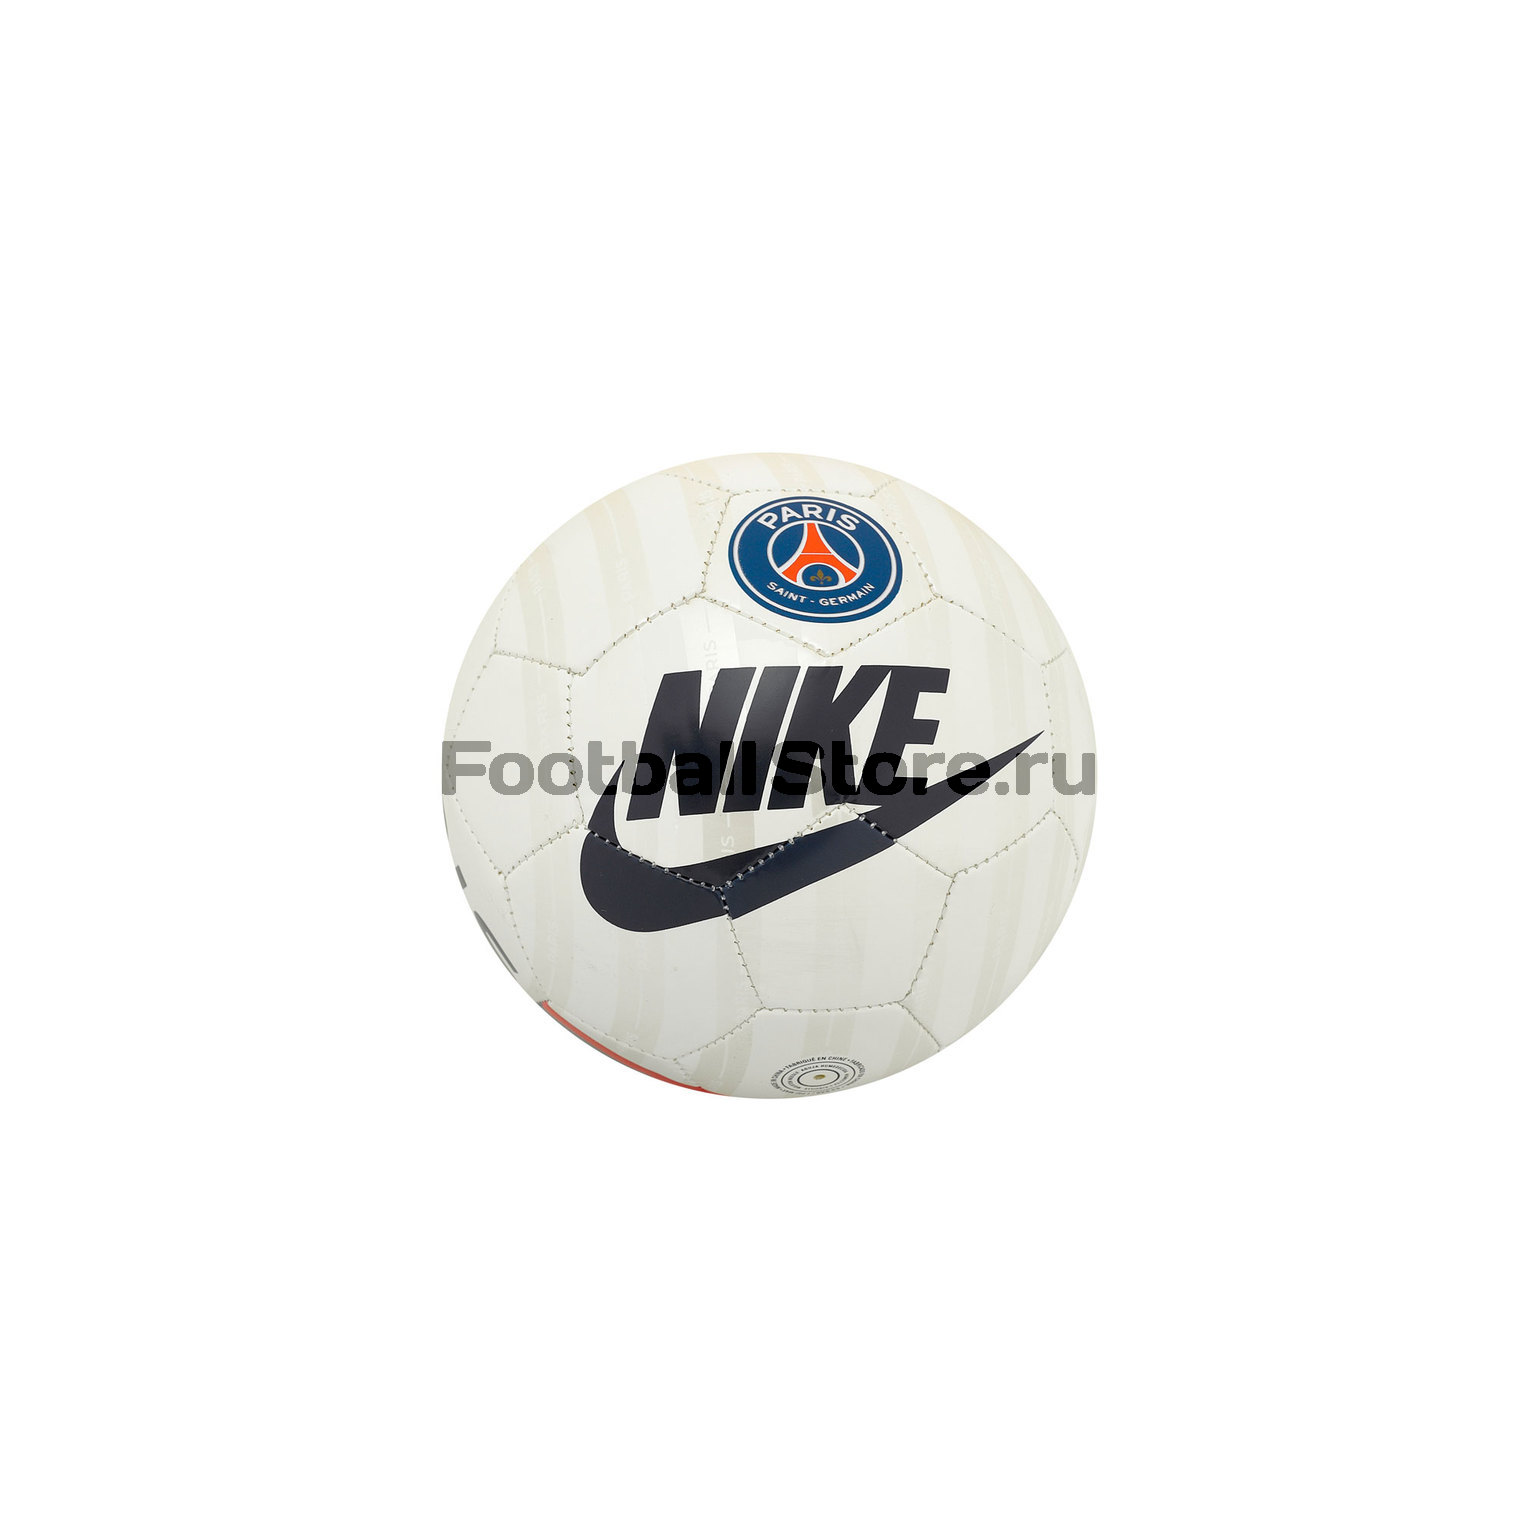 Мяч сувенирный Nike PSG Skills SC3608-100